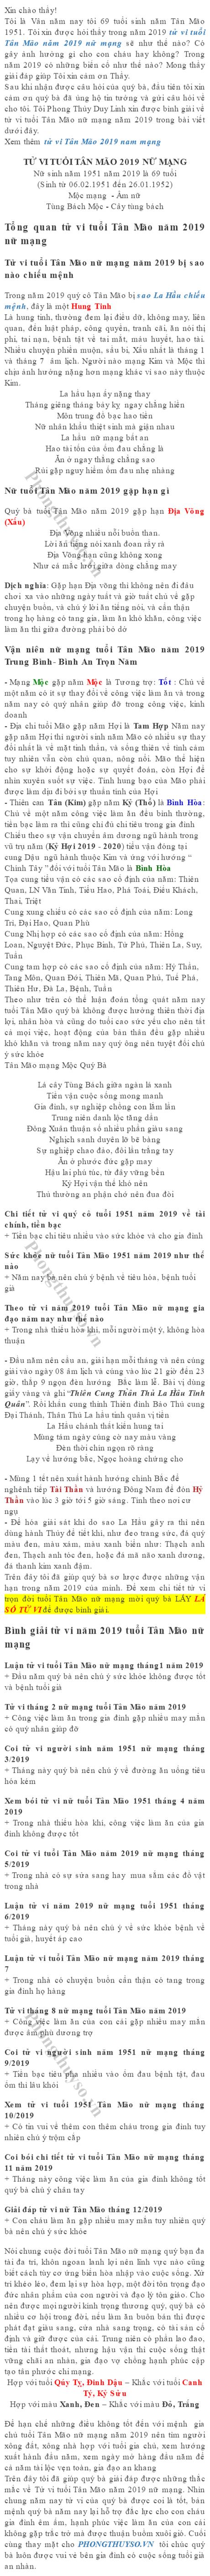 tu-vi-tuoi-tan-mao-nam-2019-nu-mang